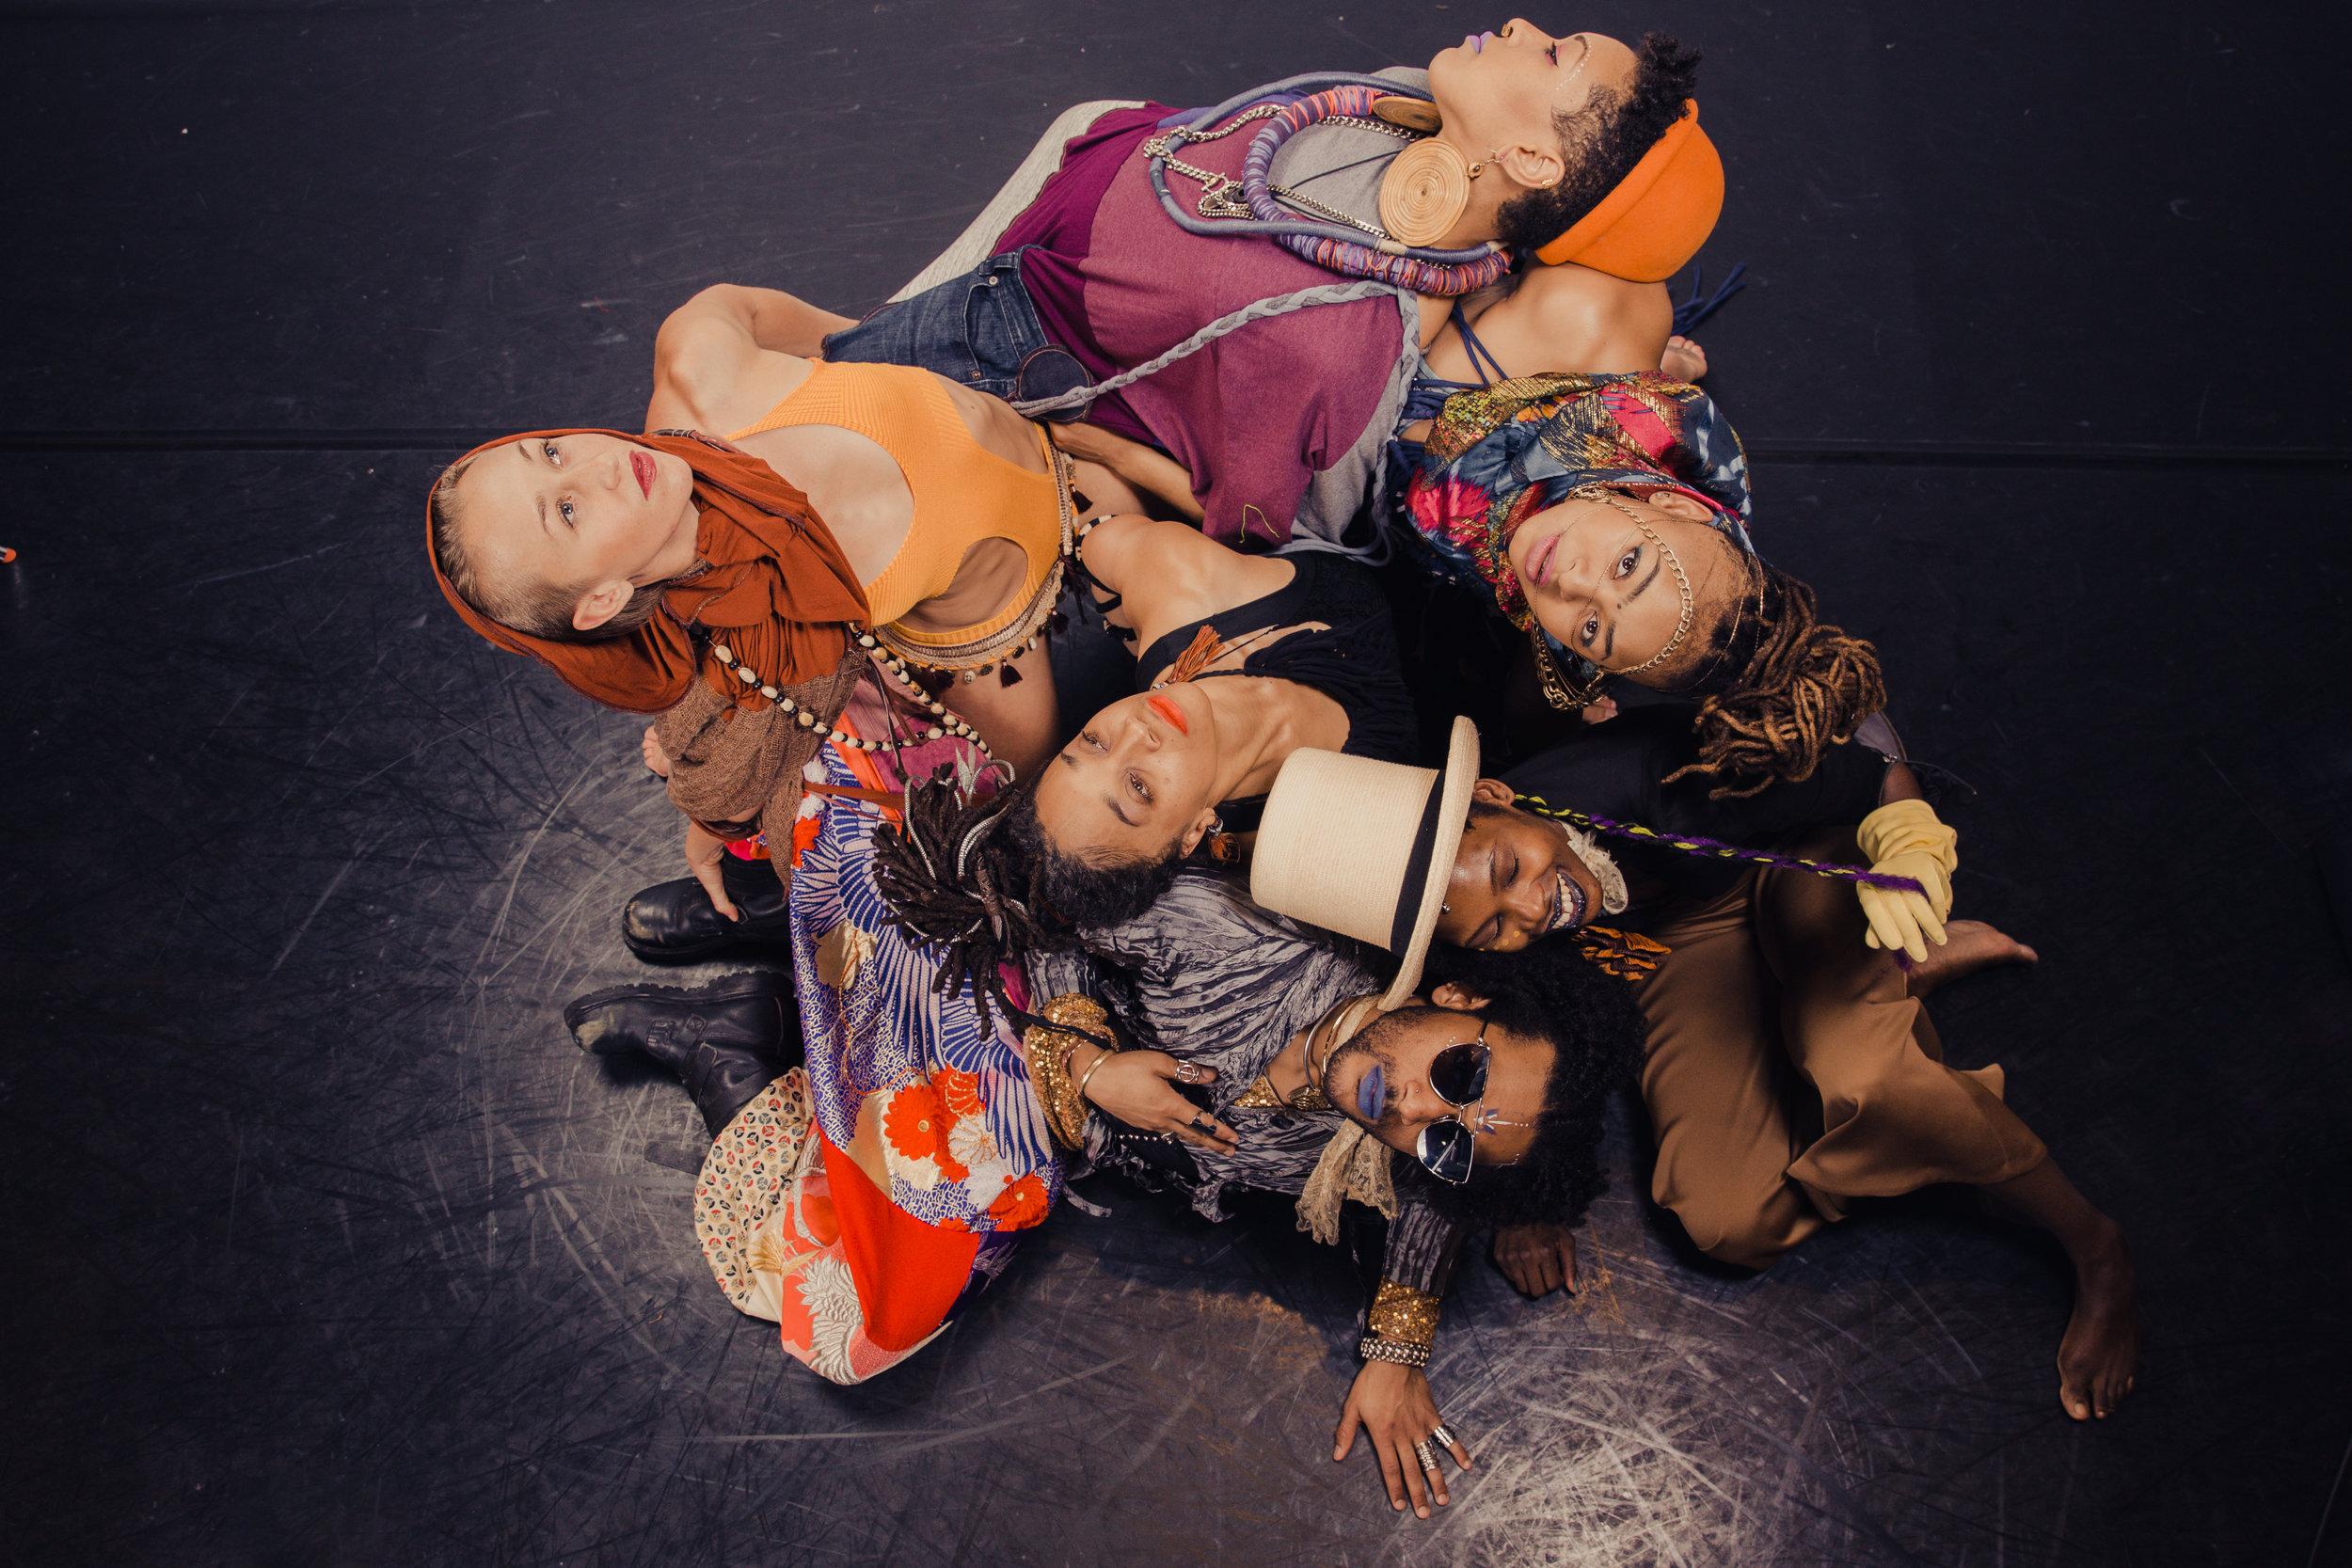 2018-19 Season - Ephrat Asherie DanceTere O'Connor DanceHedwig DancesRed Clay Dance CompanyChicago International Puppet Festival: Plexus PolaireSpectrum Dance TheaterAnanya Dance TheatreUrban Bush Women45th Anniversary Concert